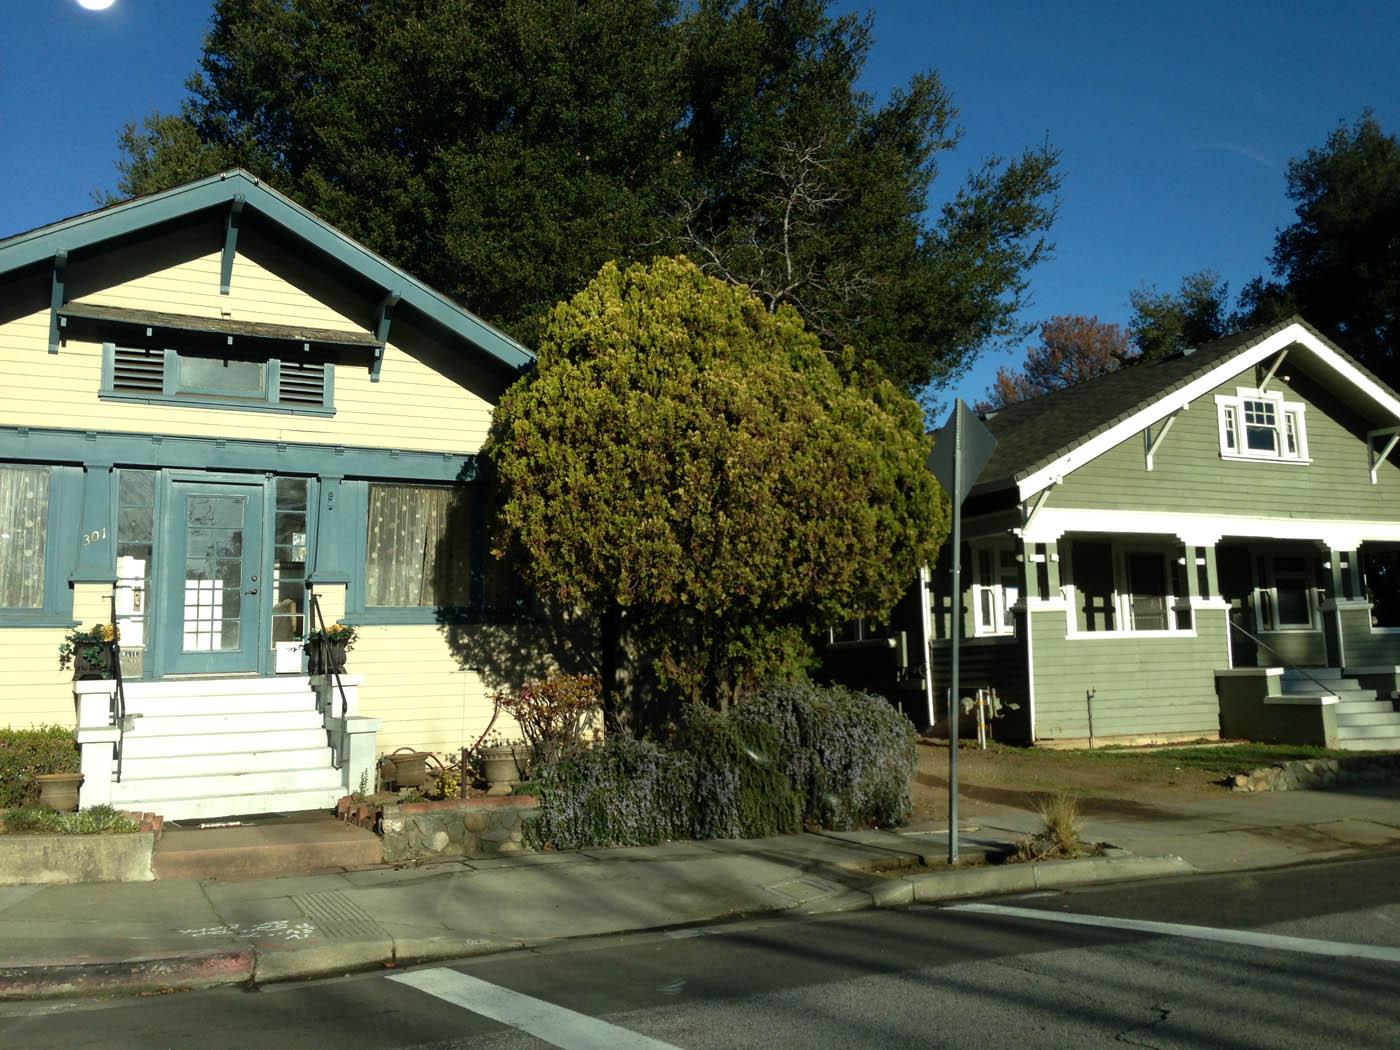 LG Blvd bungalowsS